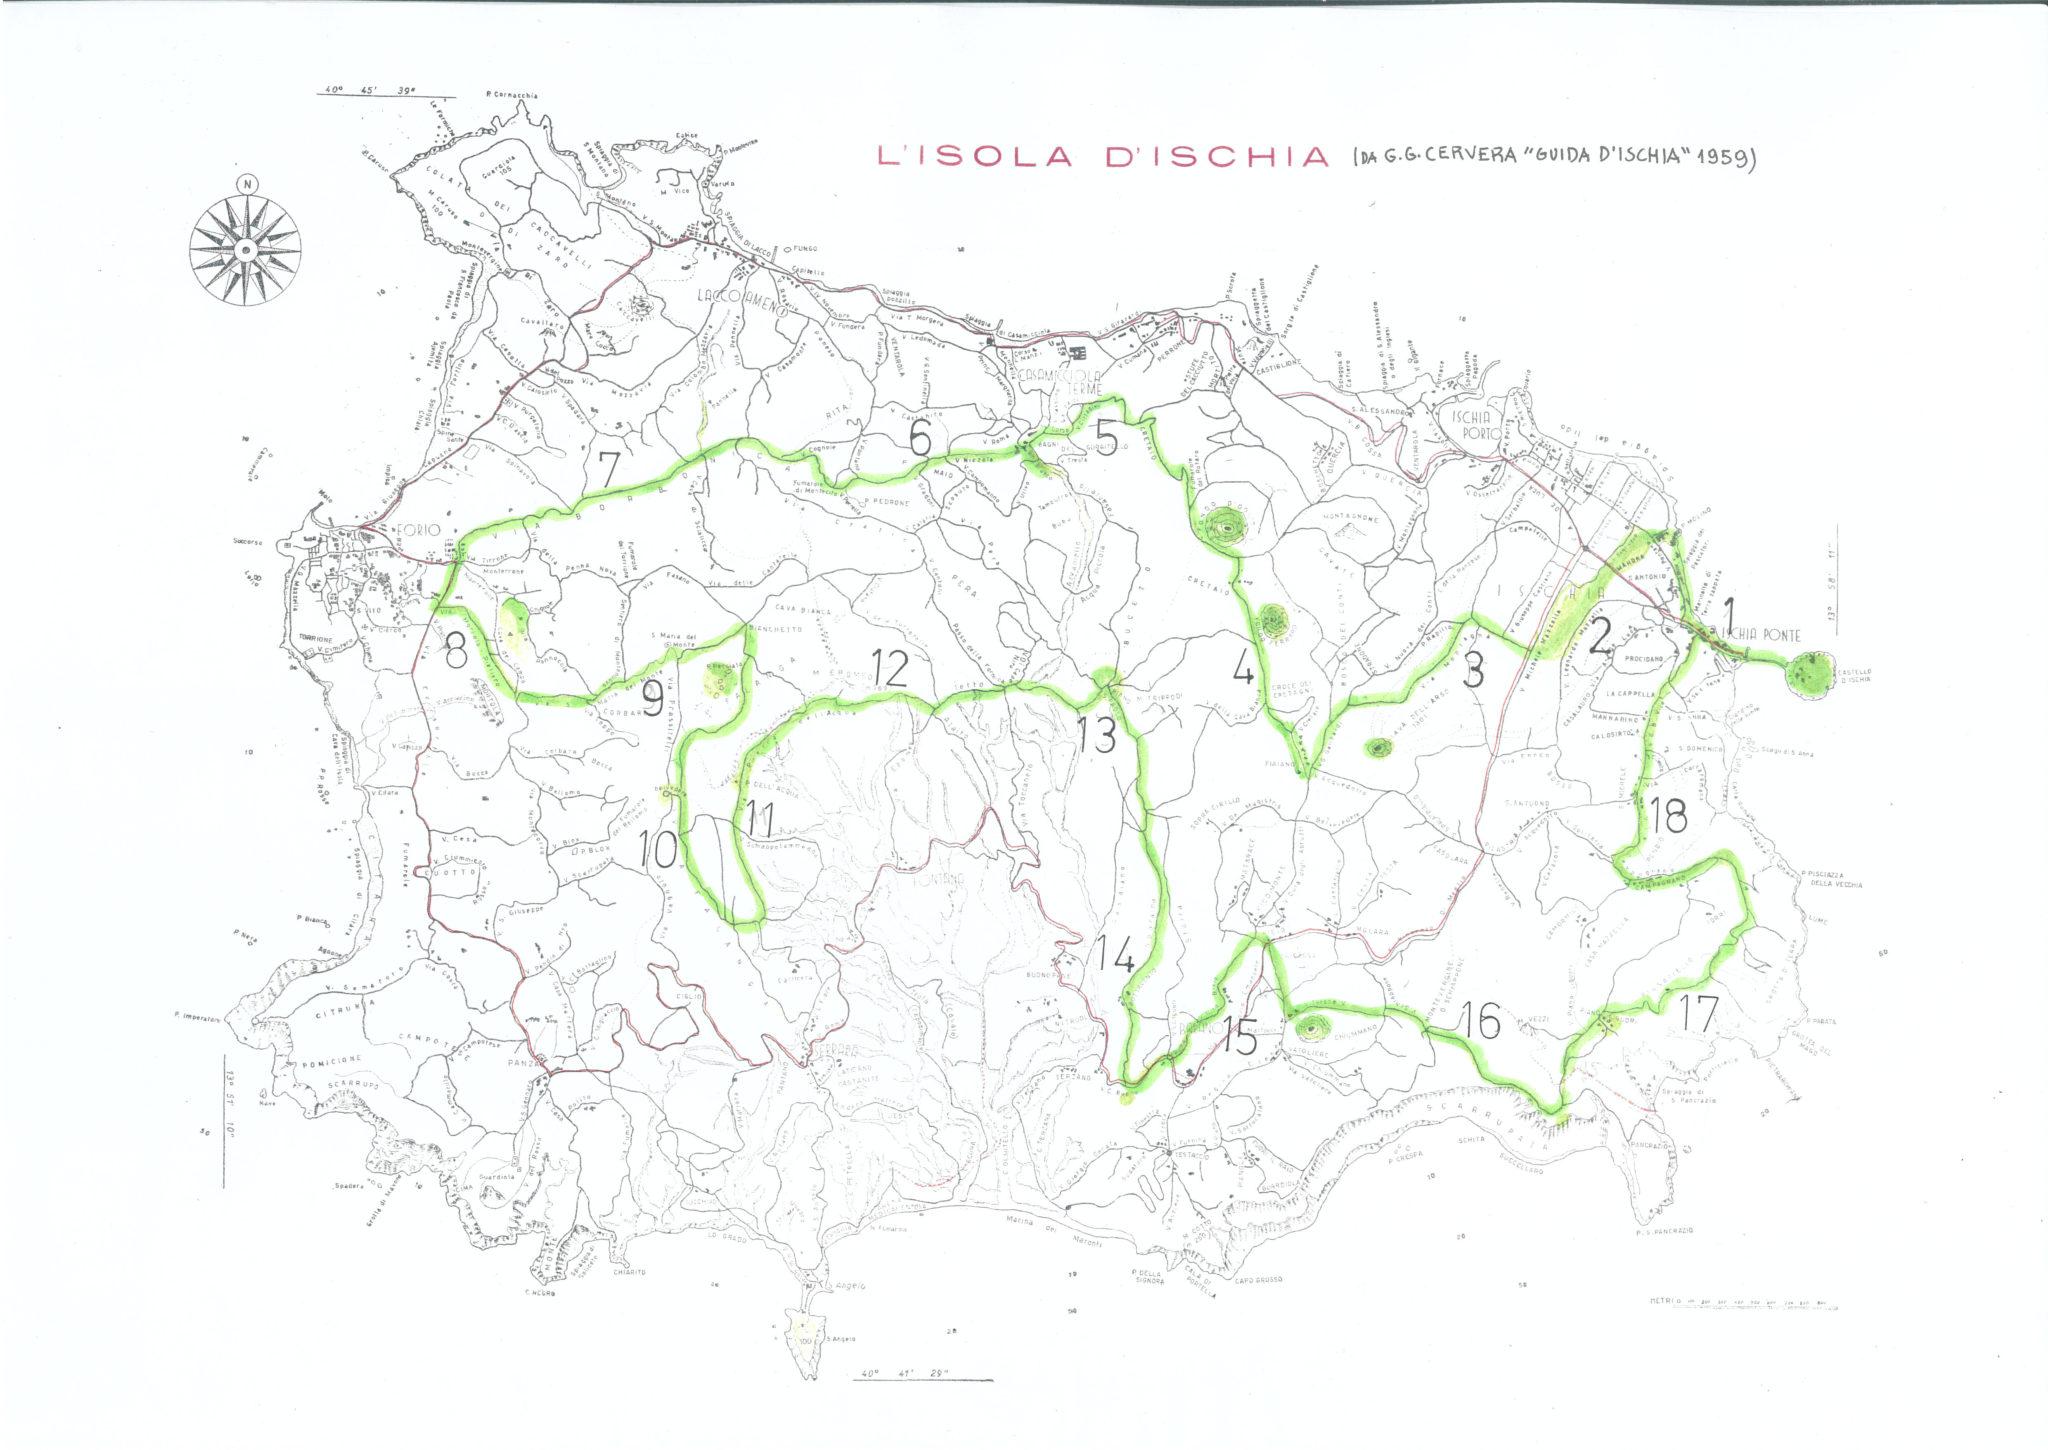 Ischia insolita e segreta - Mappa d'Ischia 1959